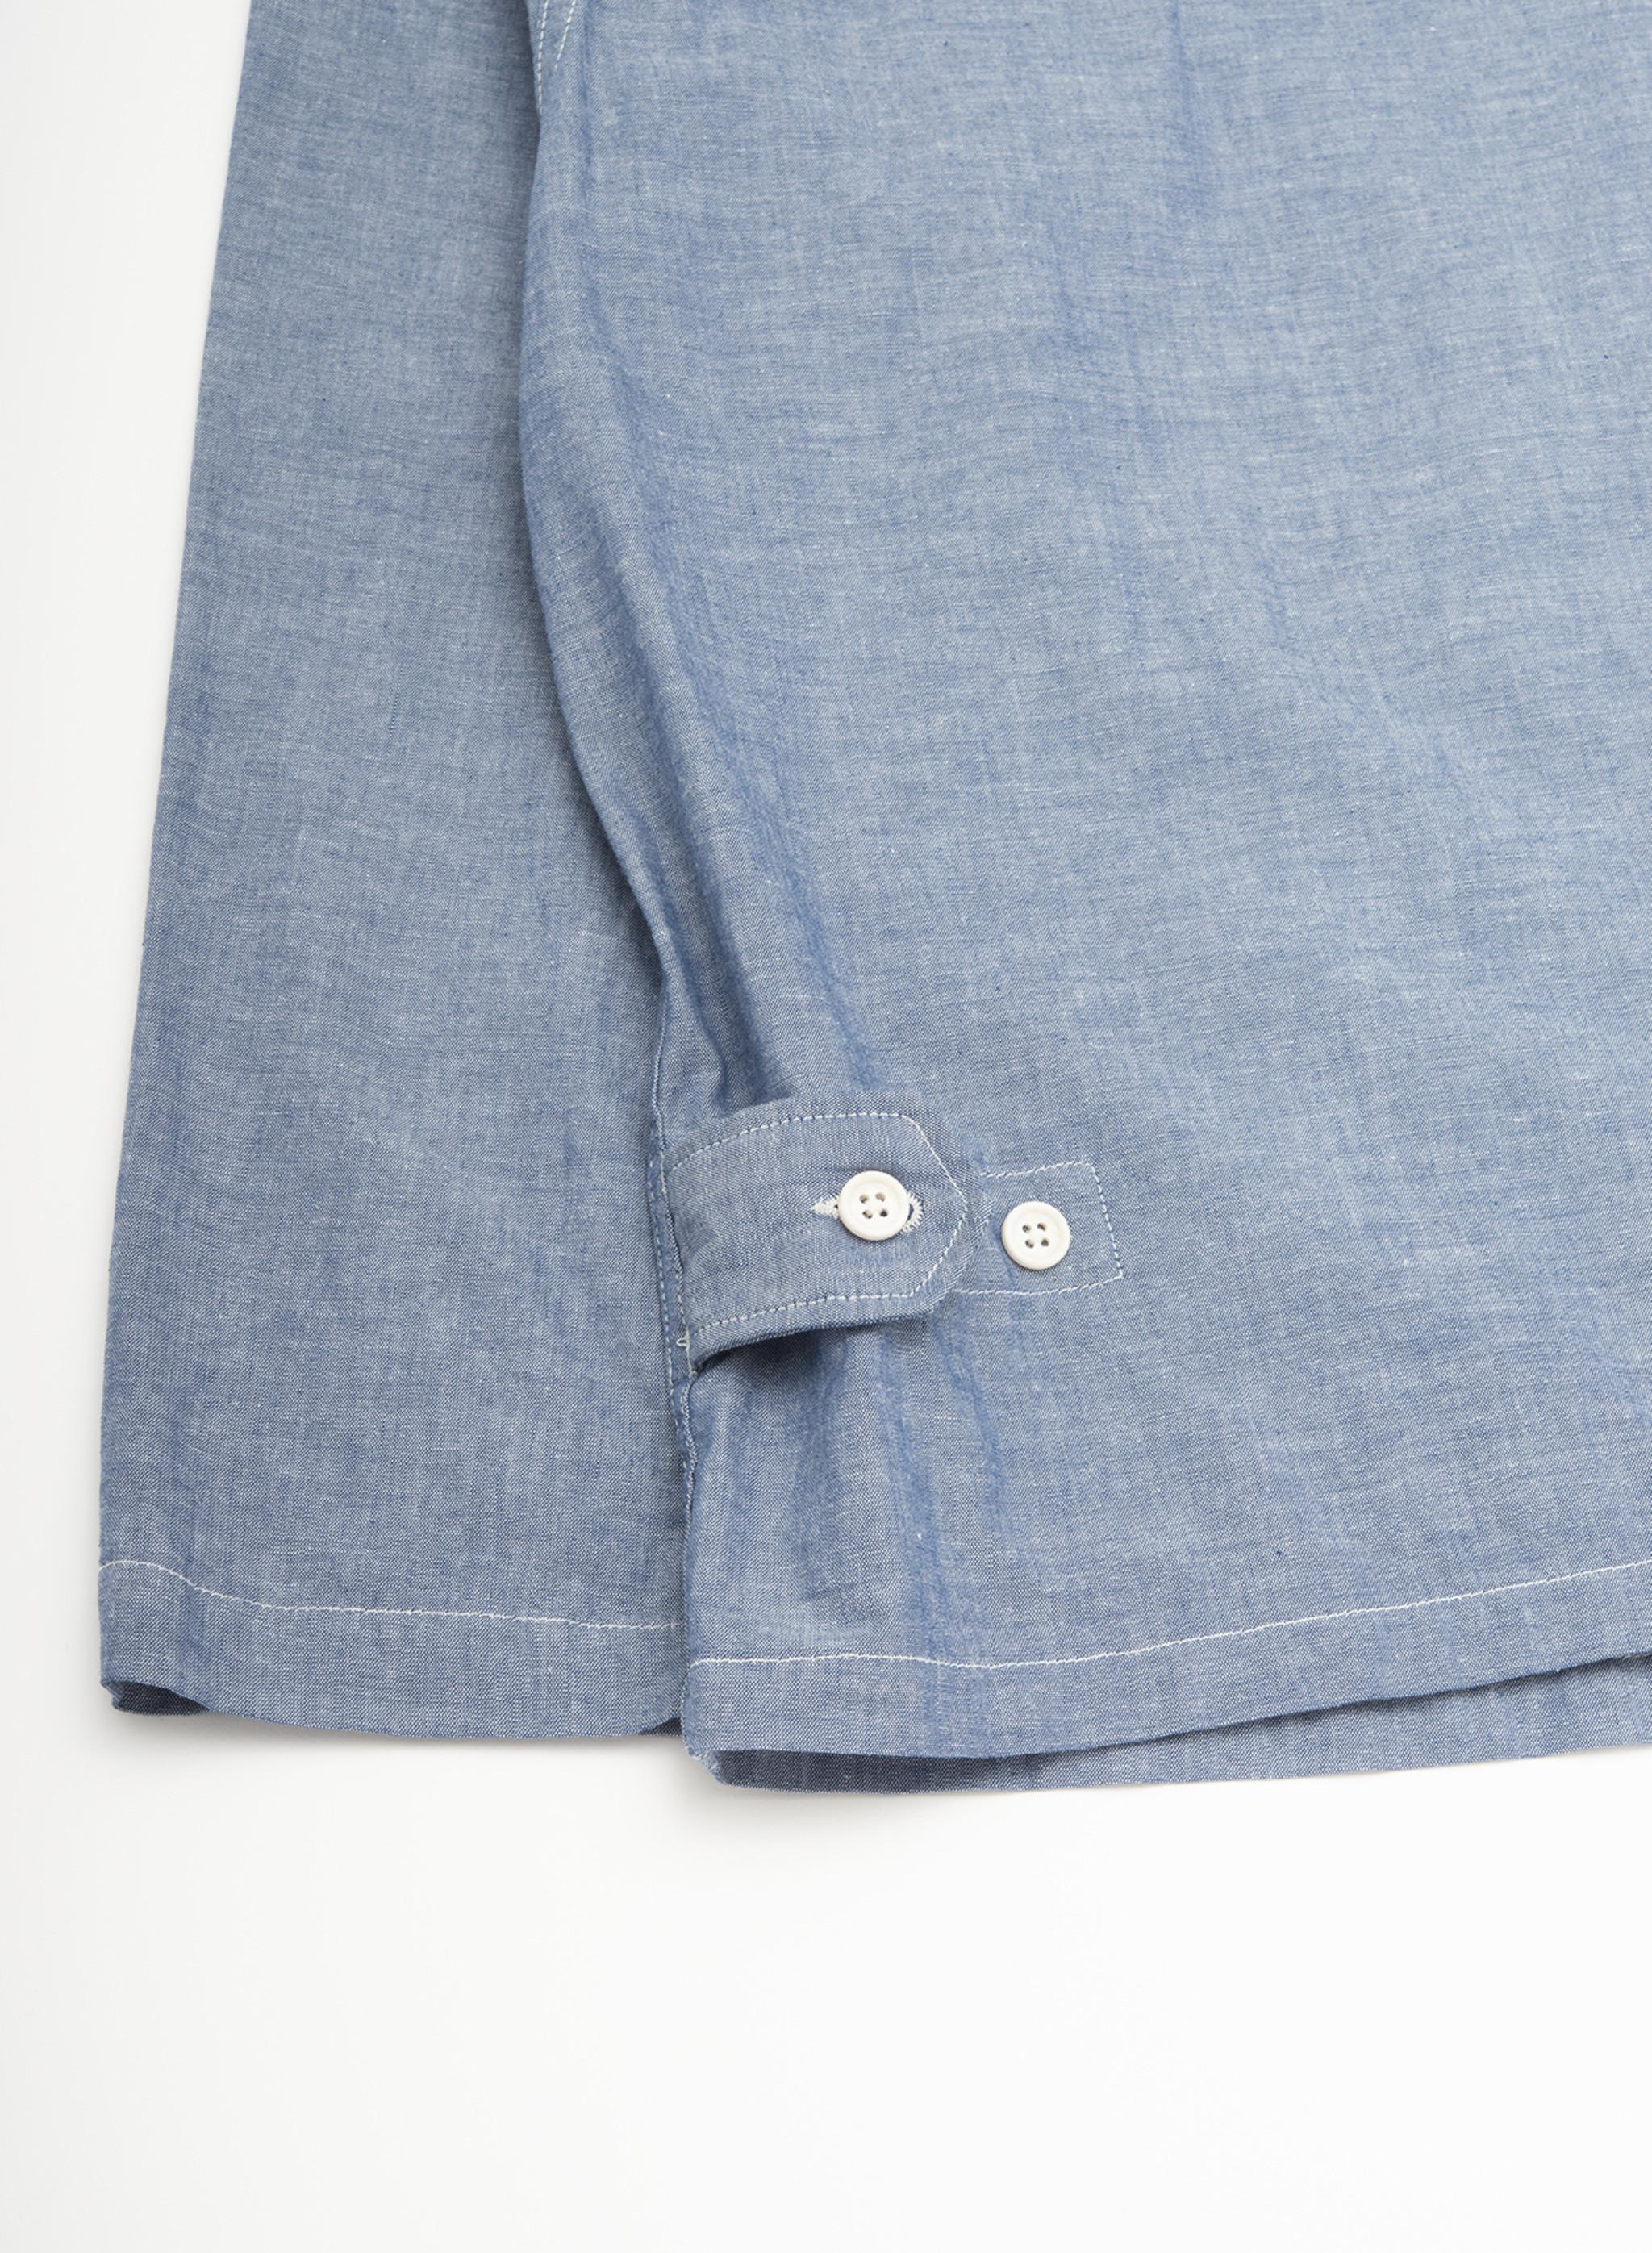 Engineered Garments Cardigan Jacket - Blue Cotton Chambray